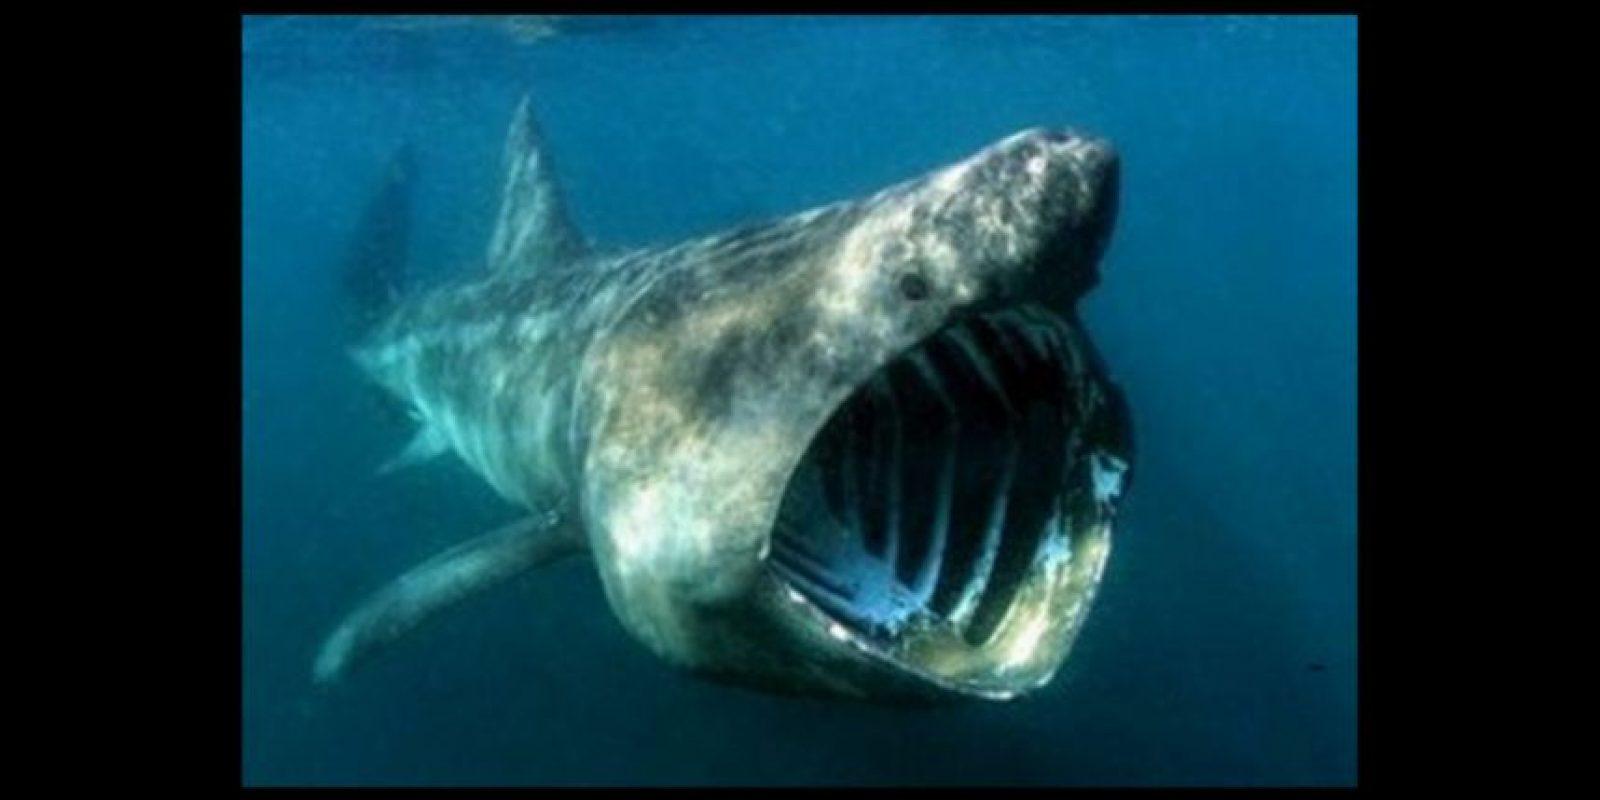 Tiburón peregrino Foto:Wikicommons